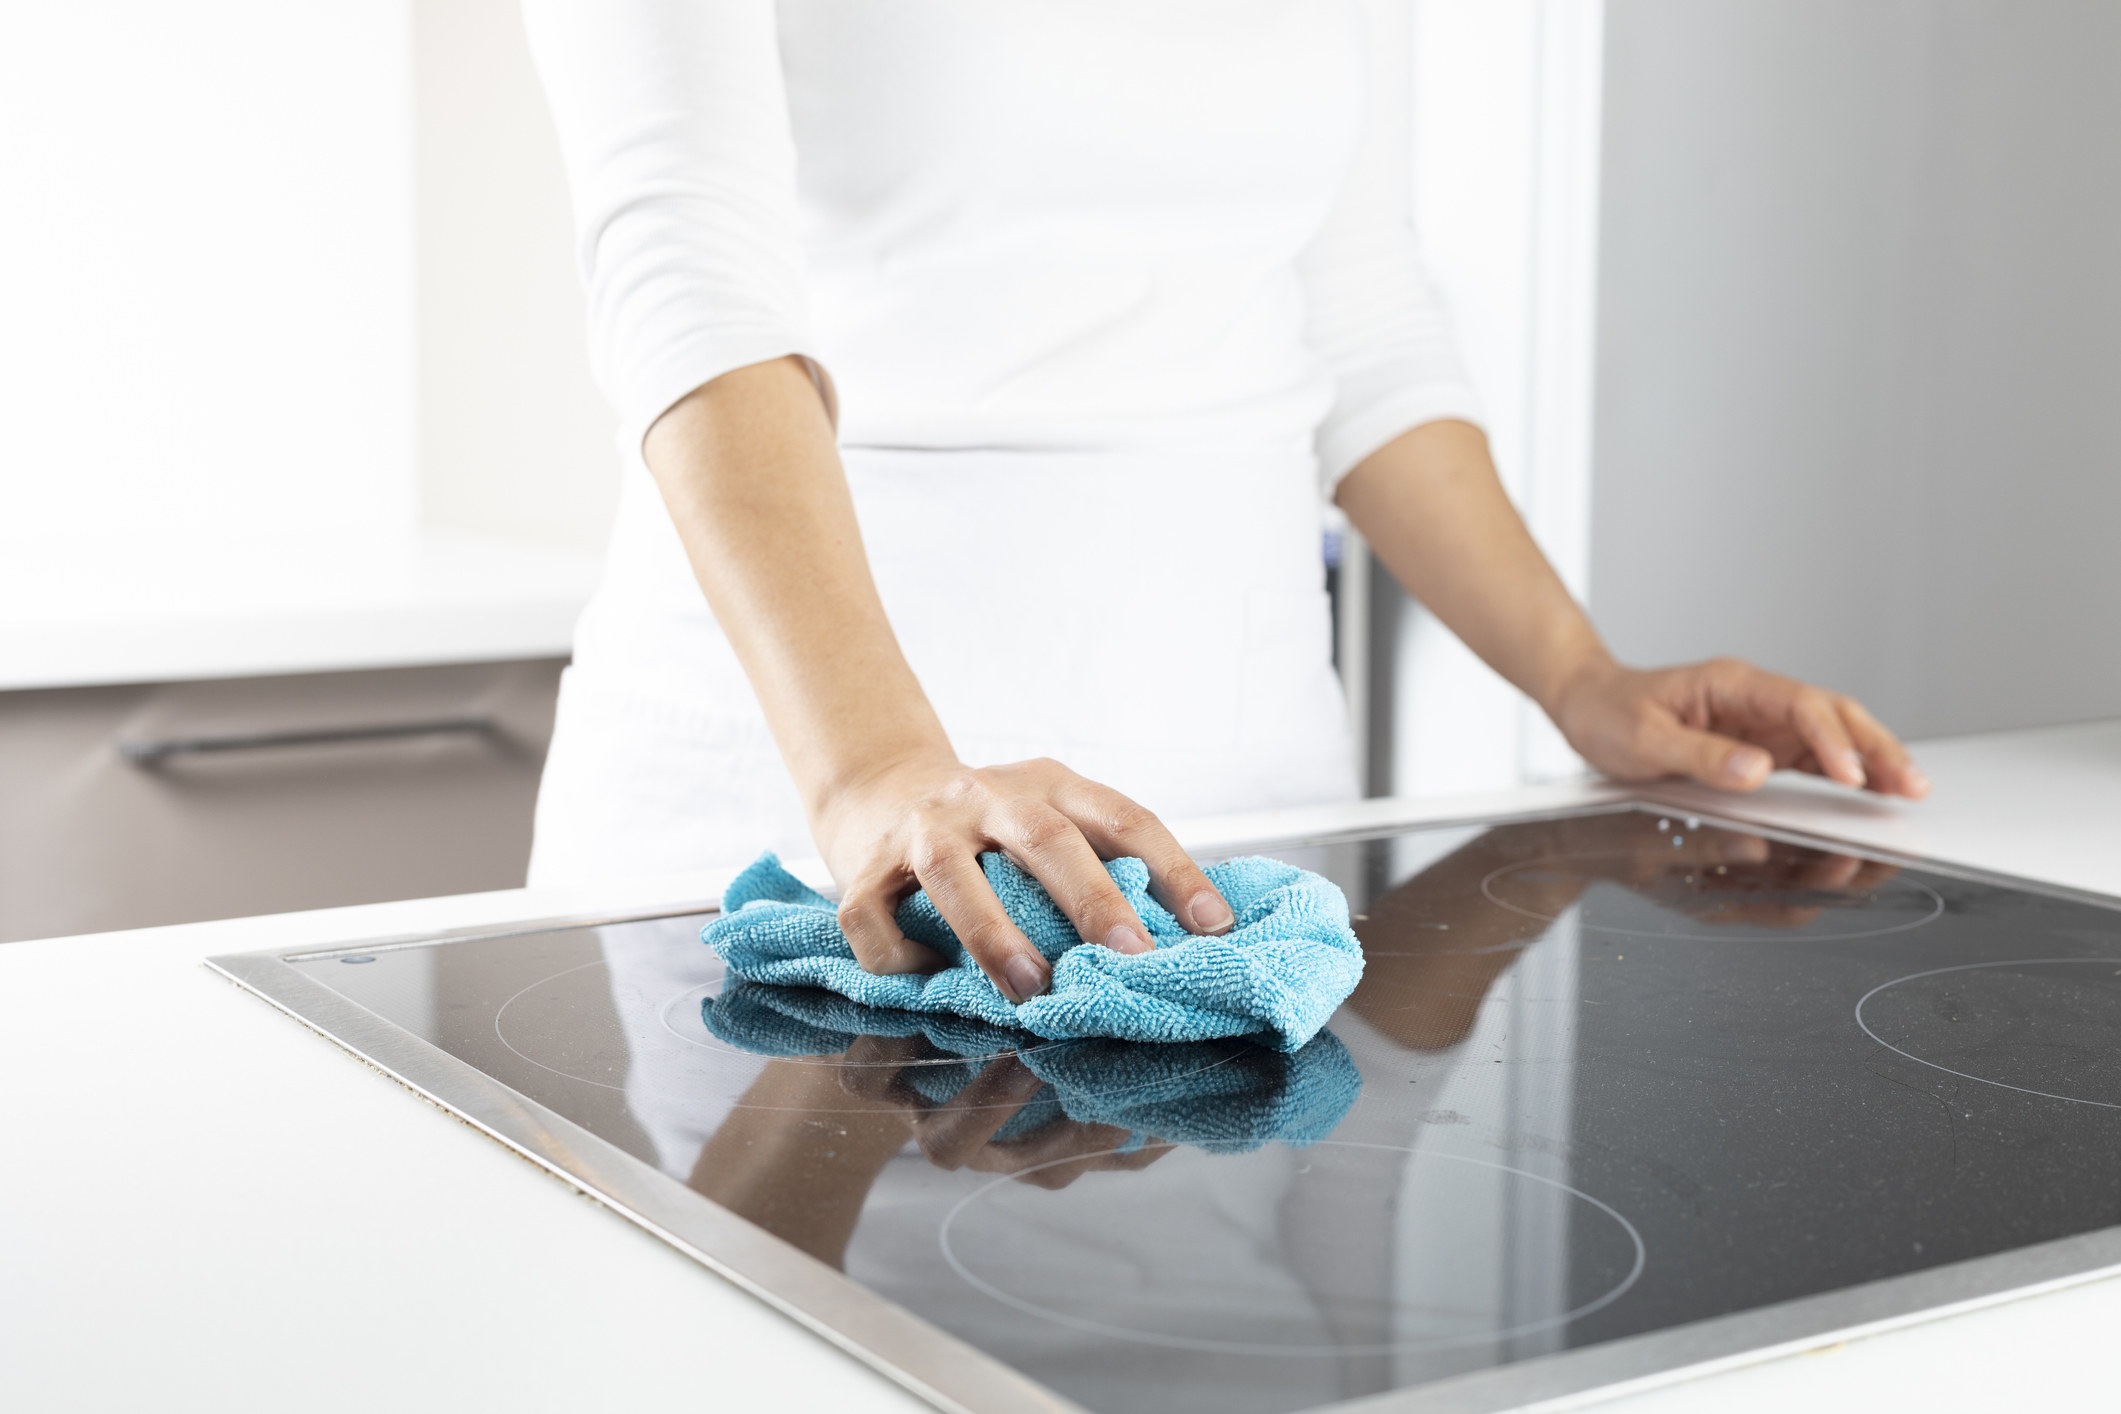 A hand scrubbing a counter